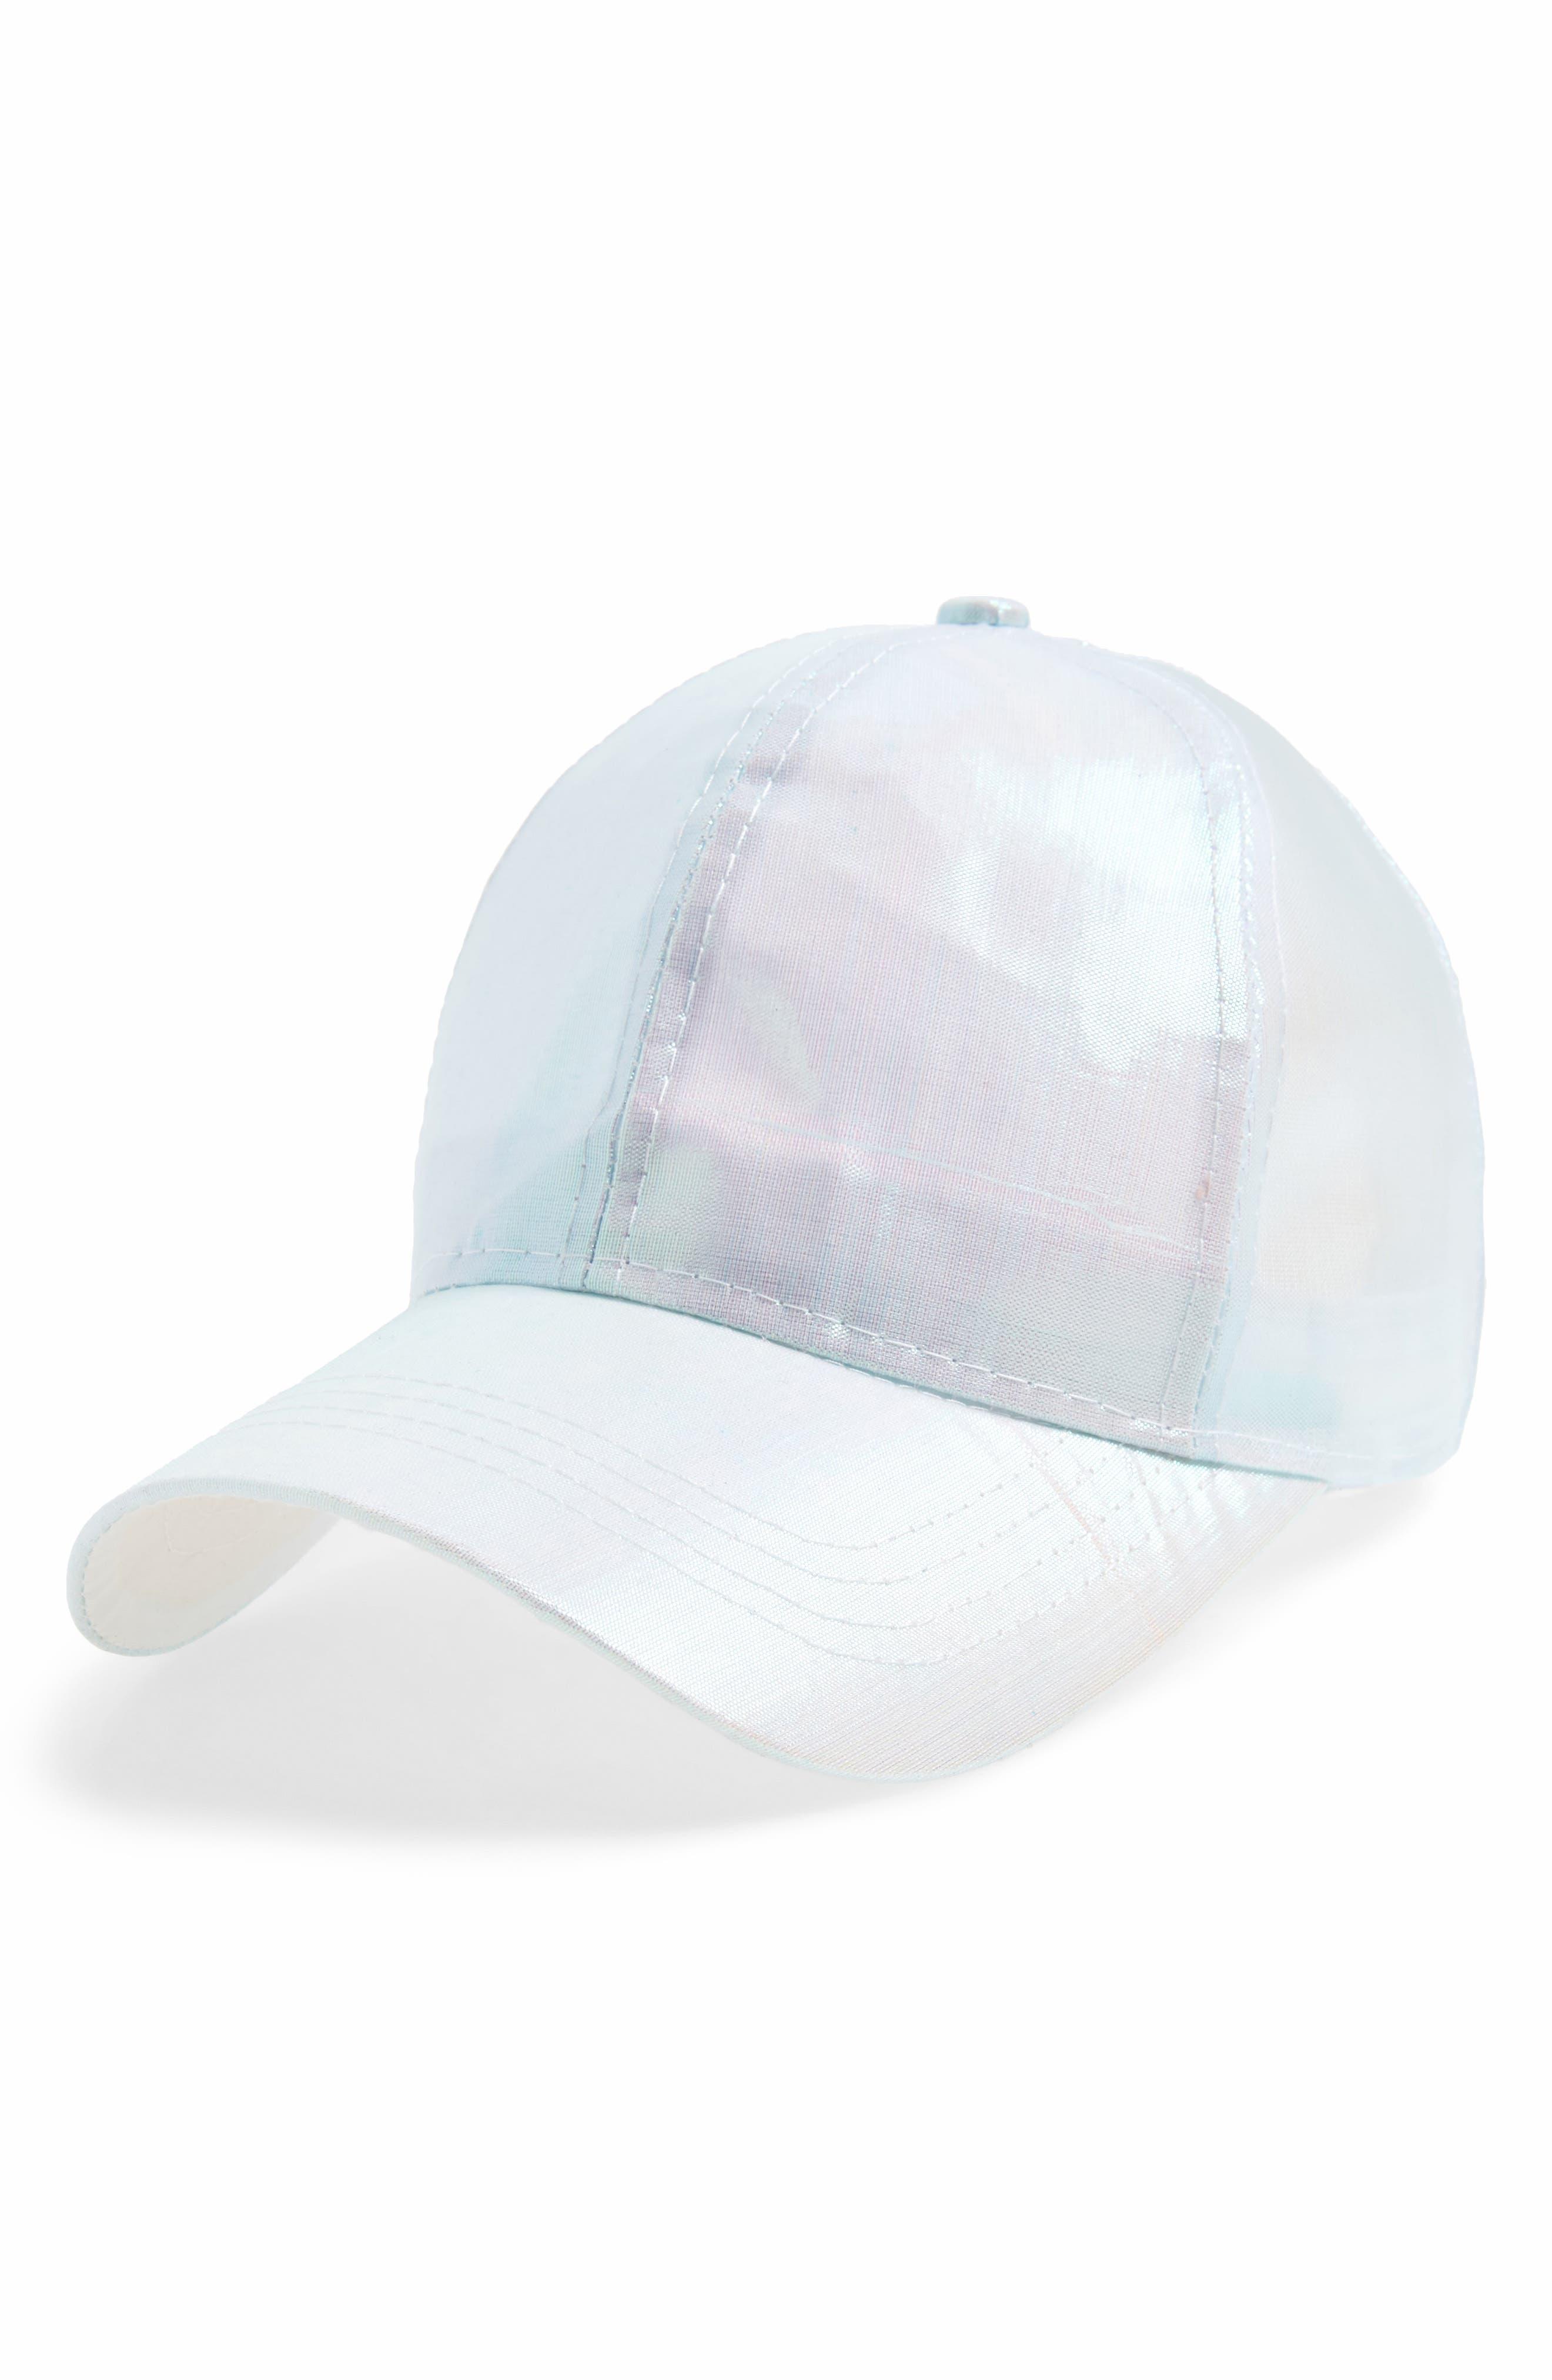 Cara Iridescent Ball Cap,                         Main,                         color, Blue Irridescant